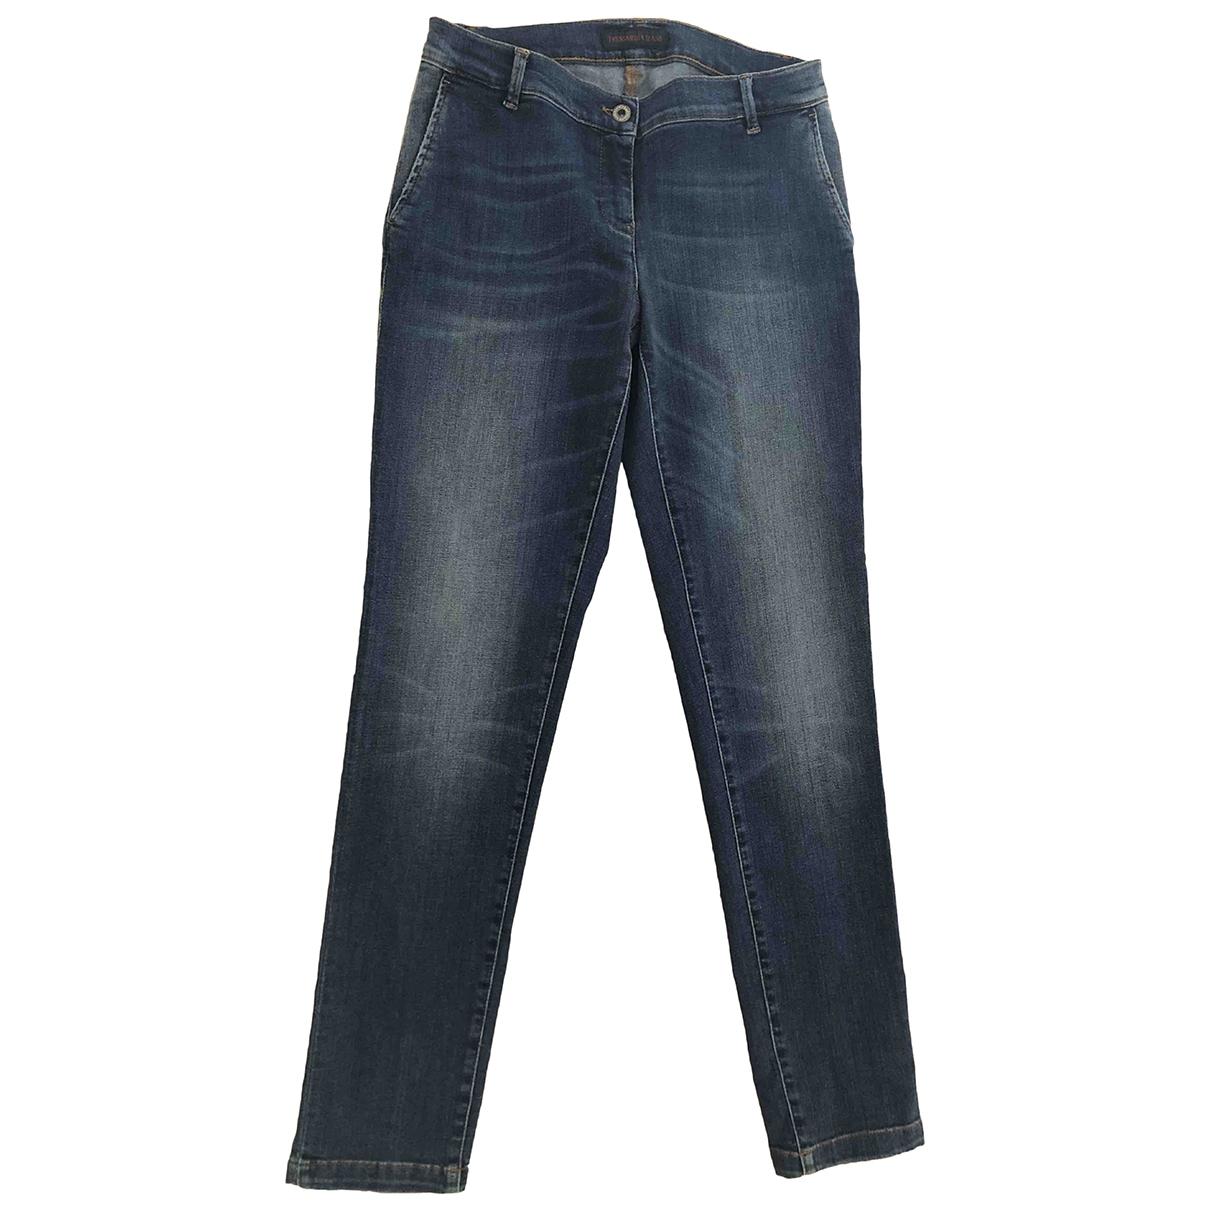 Trussardi Jeans \N Blue Cotton - elasthane Jeans for Women 40 FR